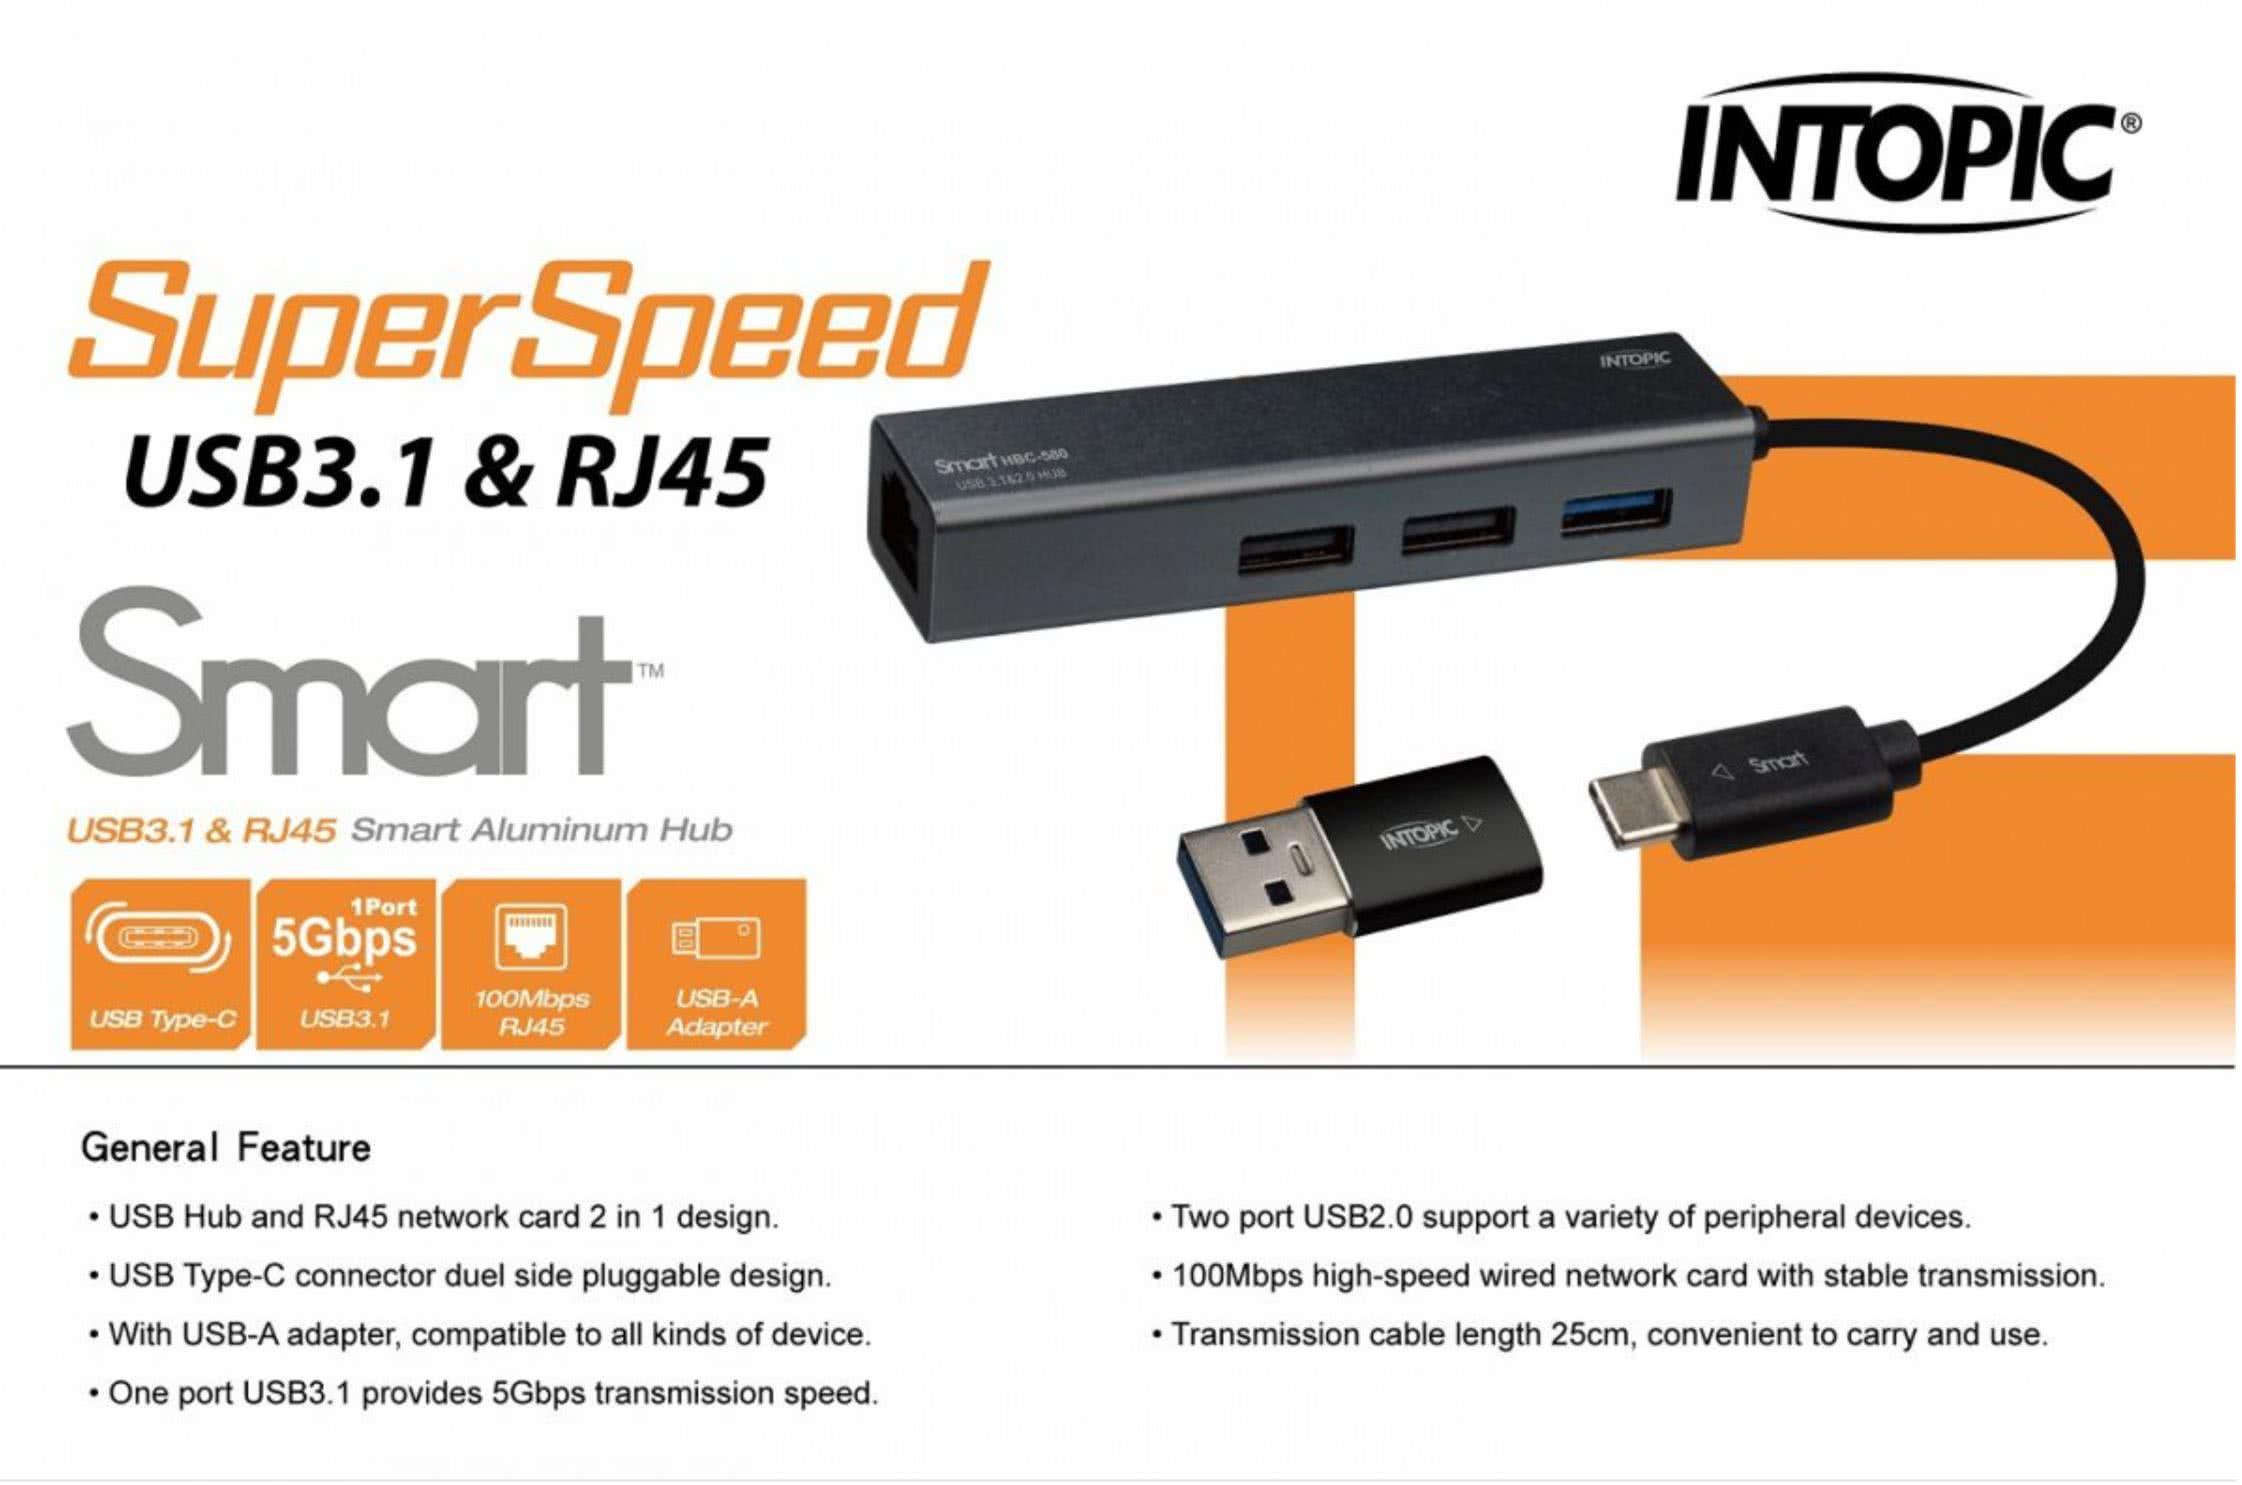 Combo USB 3.1 Type C Hub | 2x USB 2.0 + 1x USB 3.0 Hub with RJ45 Network Port | Intopic